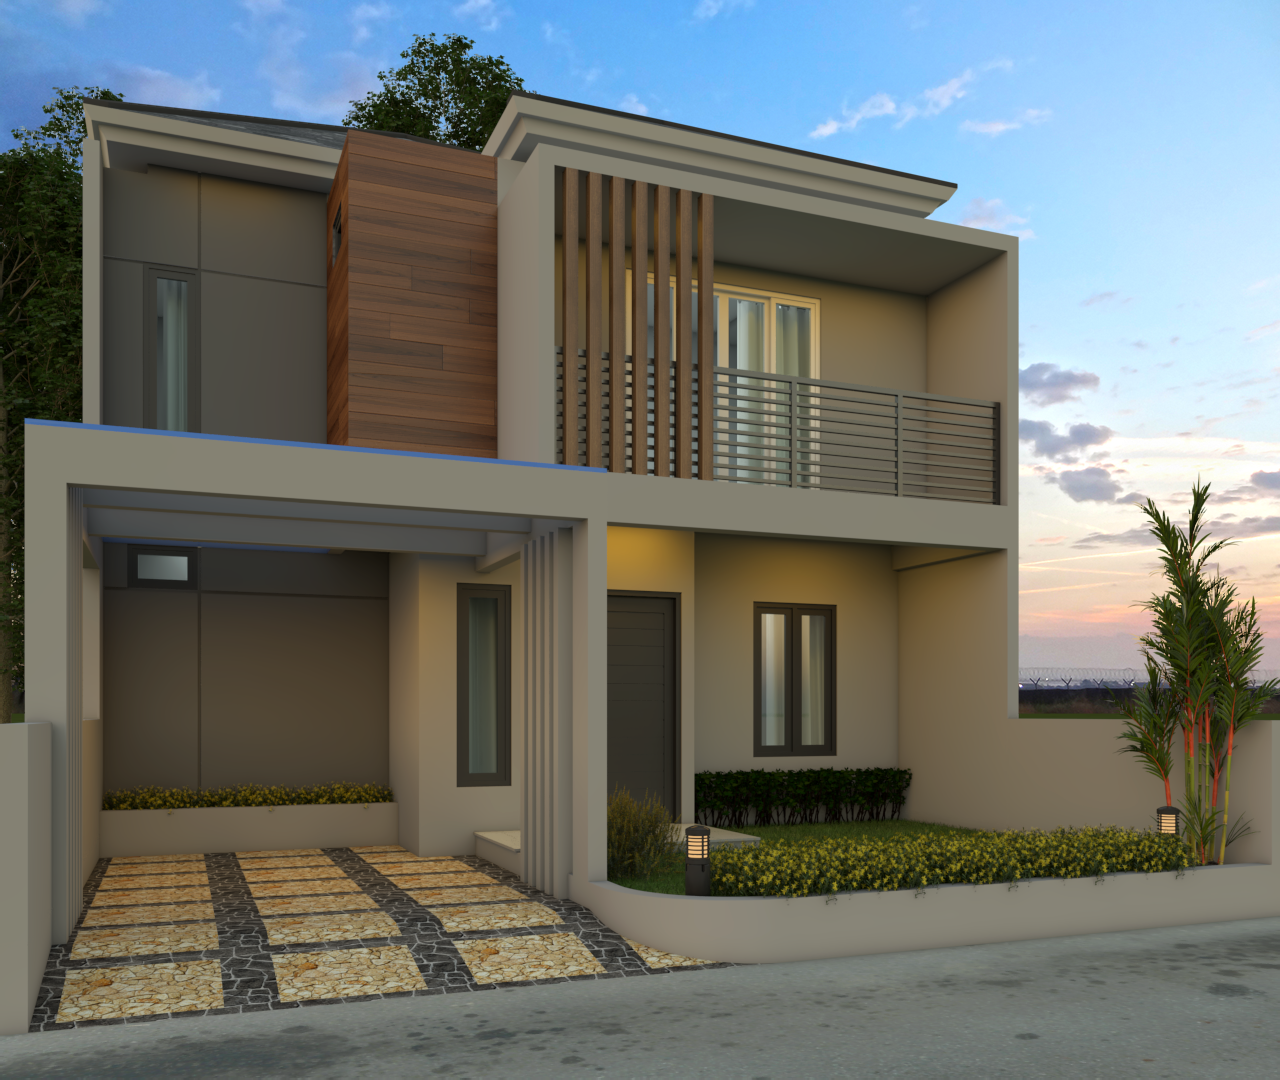 6.Denoiser 1 - Inspirasi Arsitektur Rumah Idaman